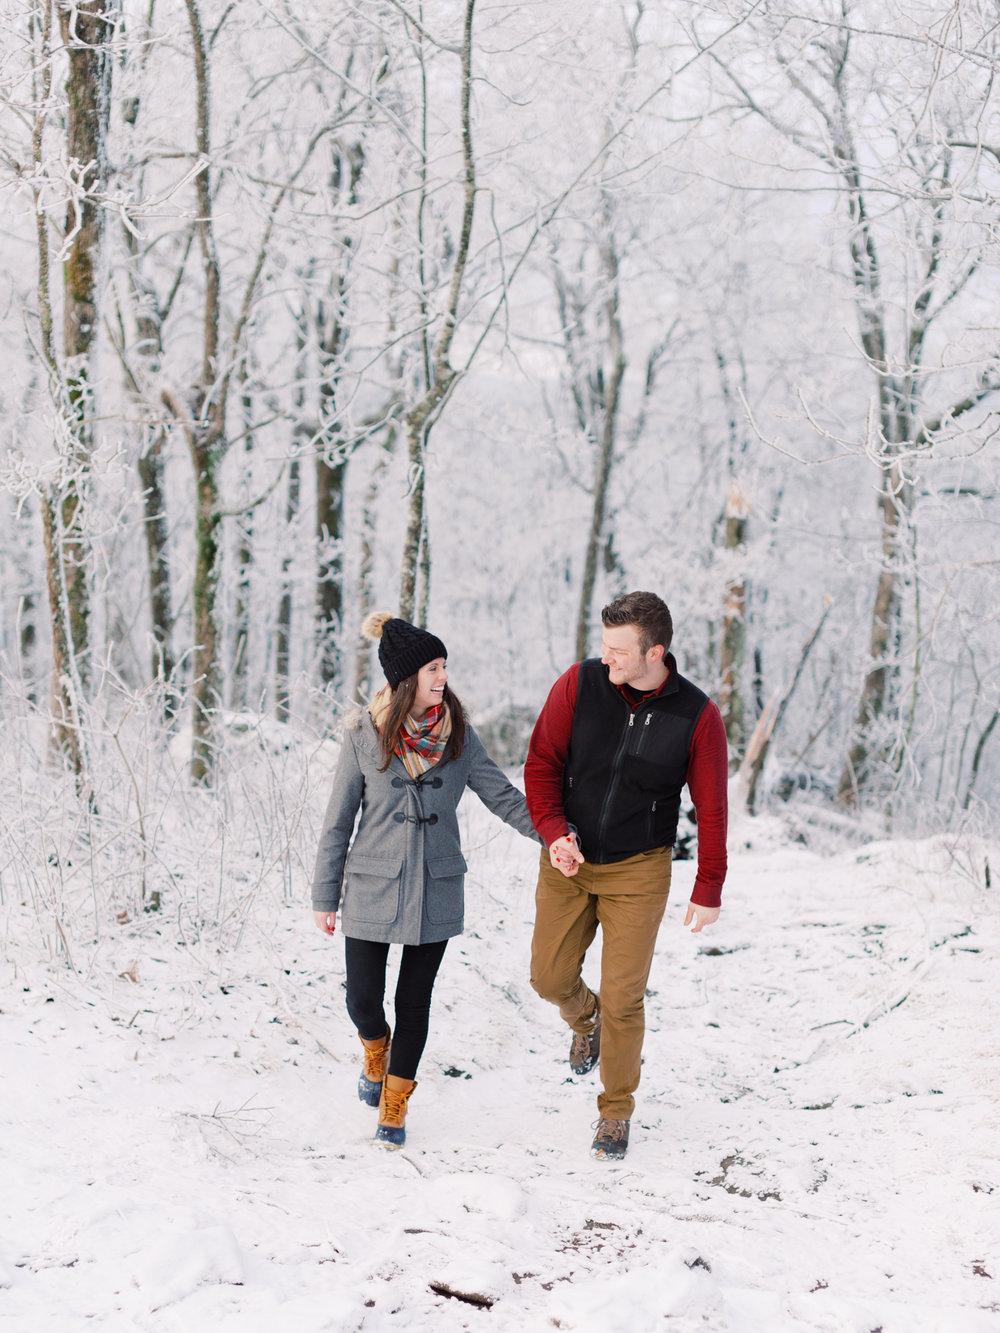 snowy-georgia-proposal-preachers-rock-atlanta-dahlonega-wedding-photographer-hannah-forsberg-fine-art-film-19.jpg